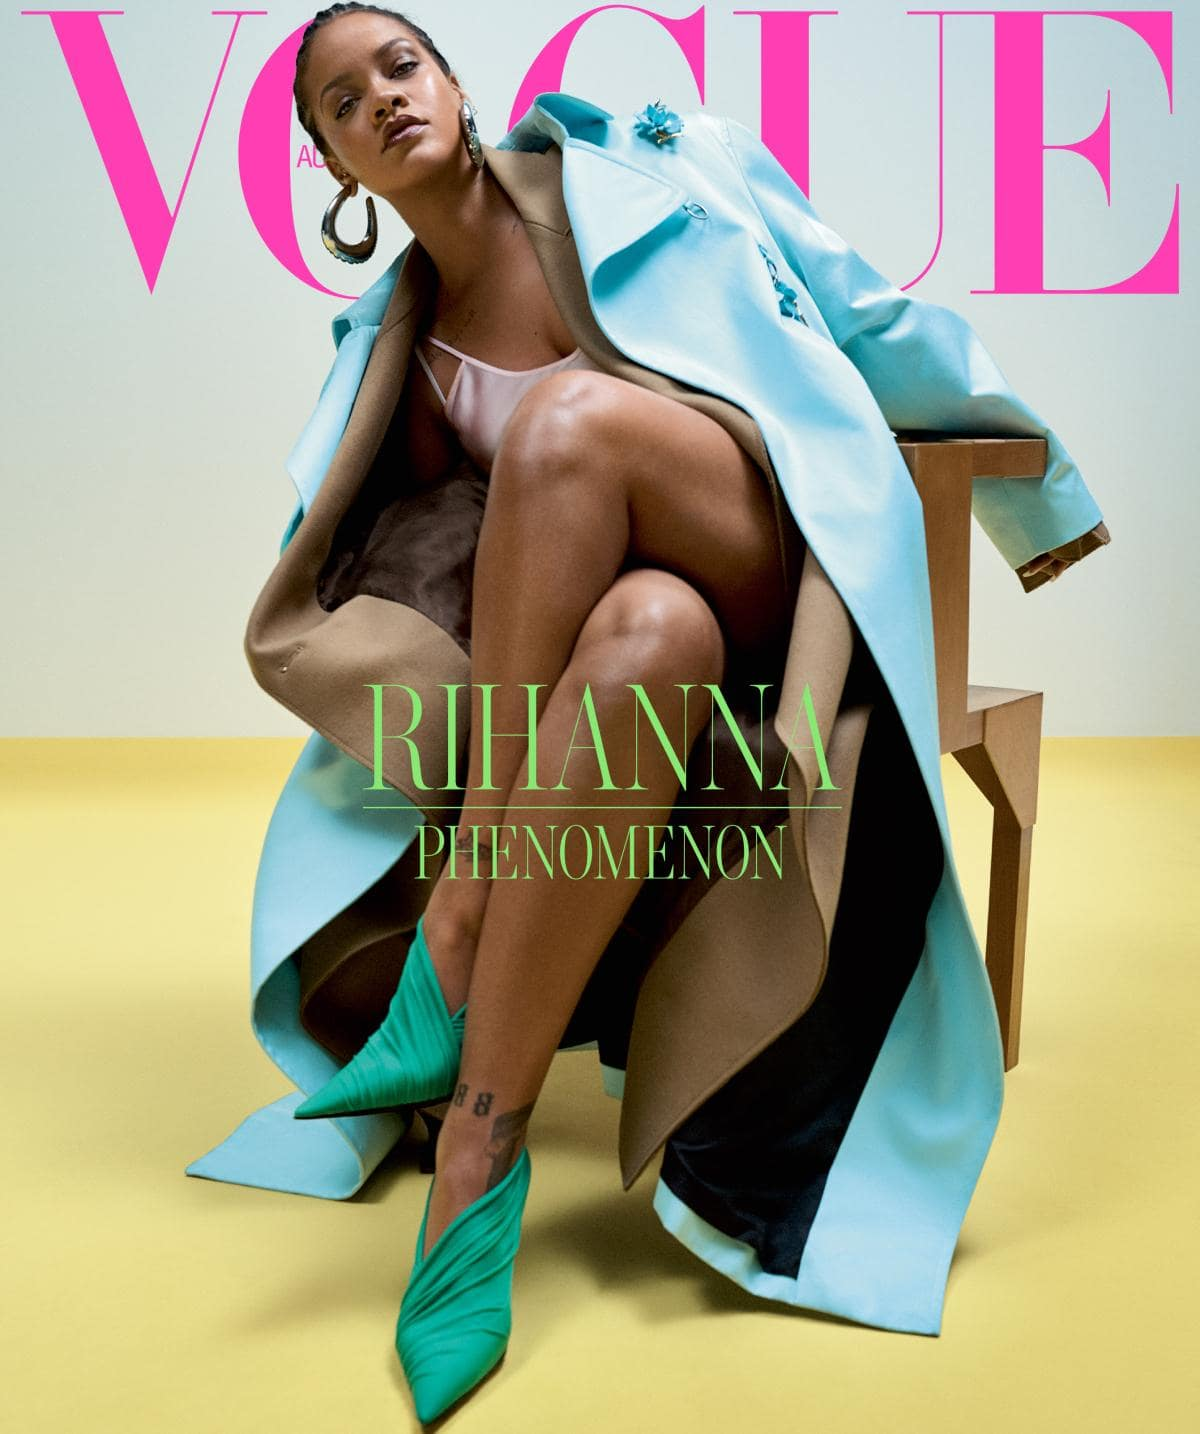 Phenomenal Rihanna covers Vogue Australia: cover